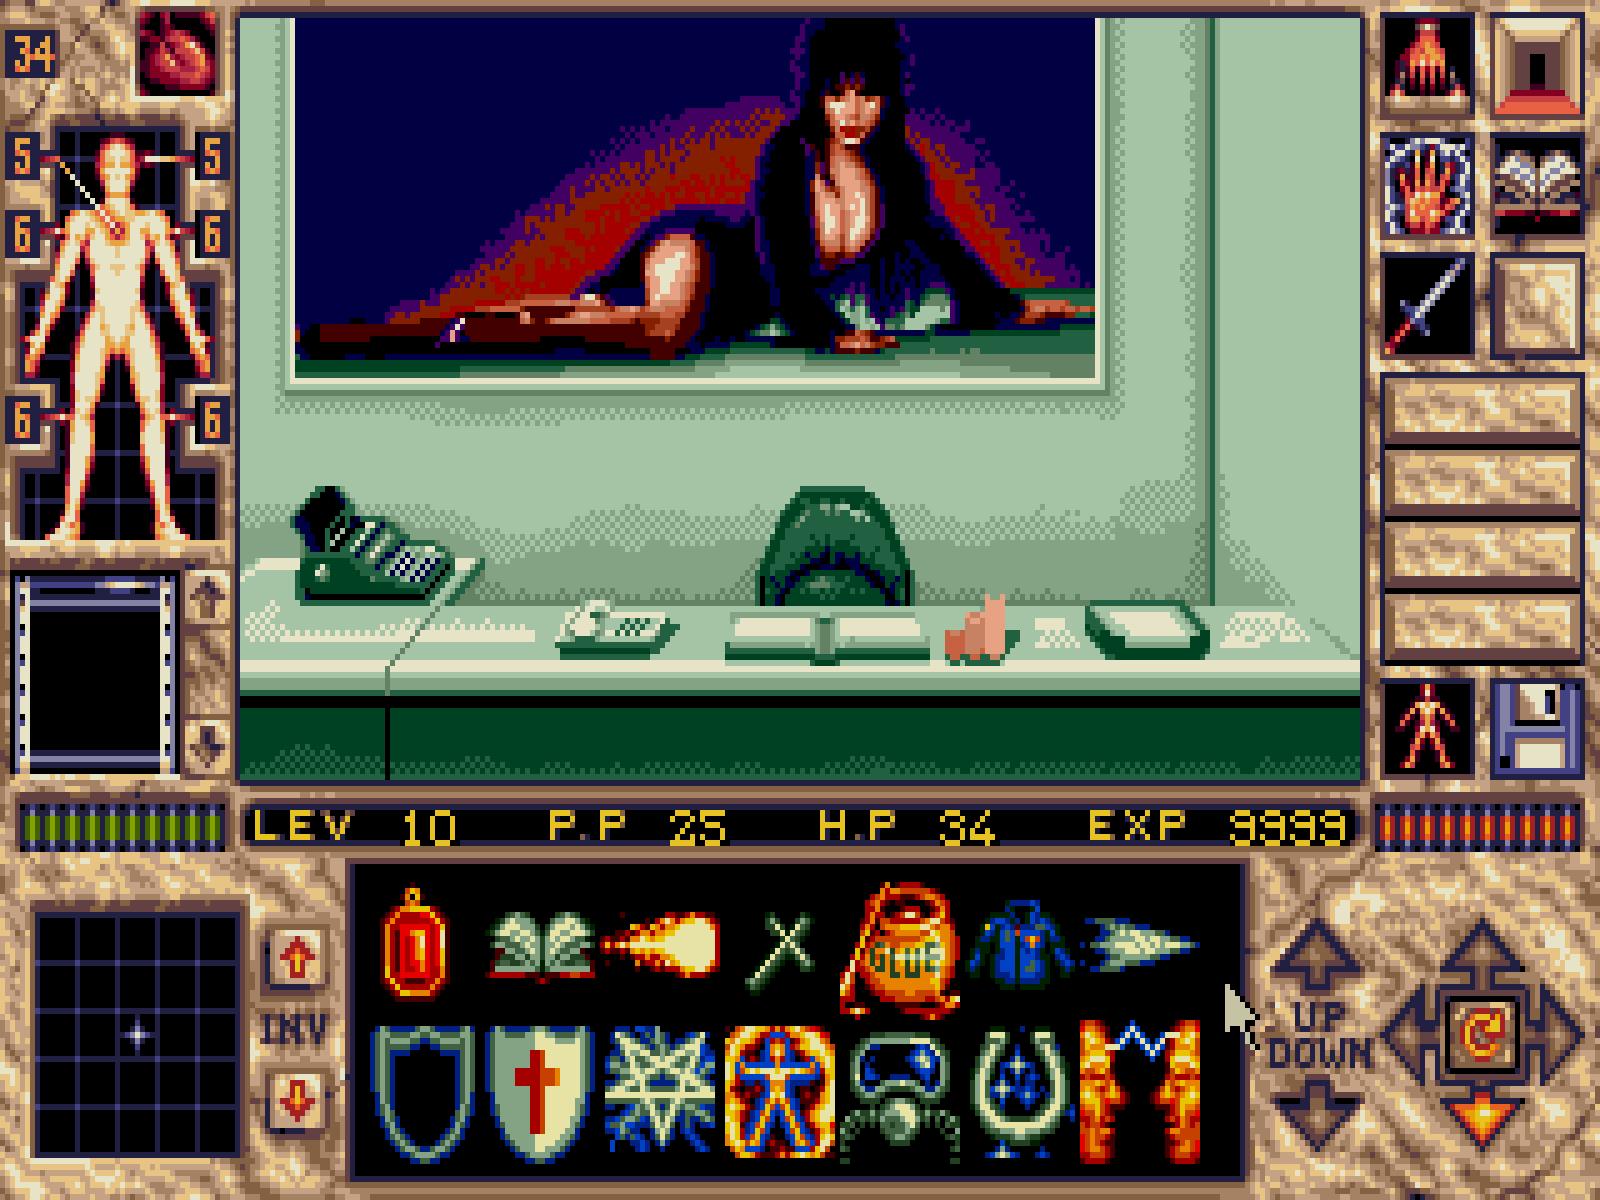 Elvira ii the jaws of cerberus clipart clip freeuse stock The Adventure Gamer: Elvira II - Final Rating clip freeuse stock